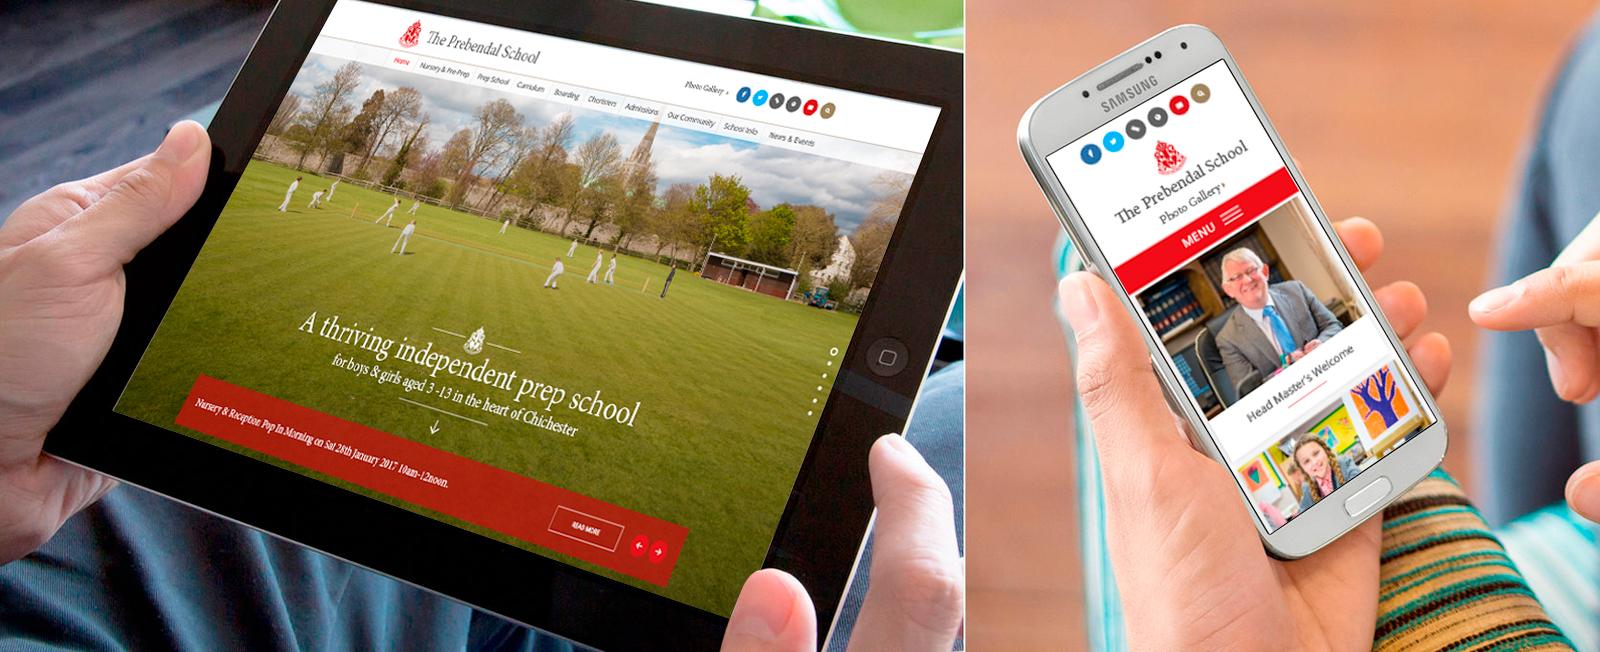 The Prebendal School school website design by cleverbox